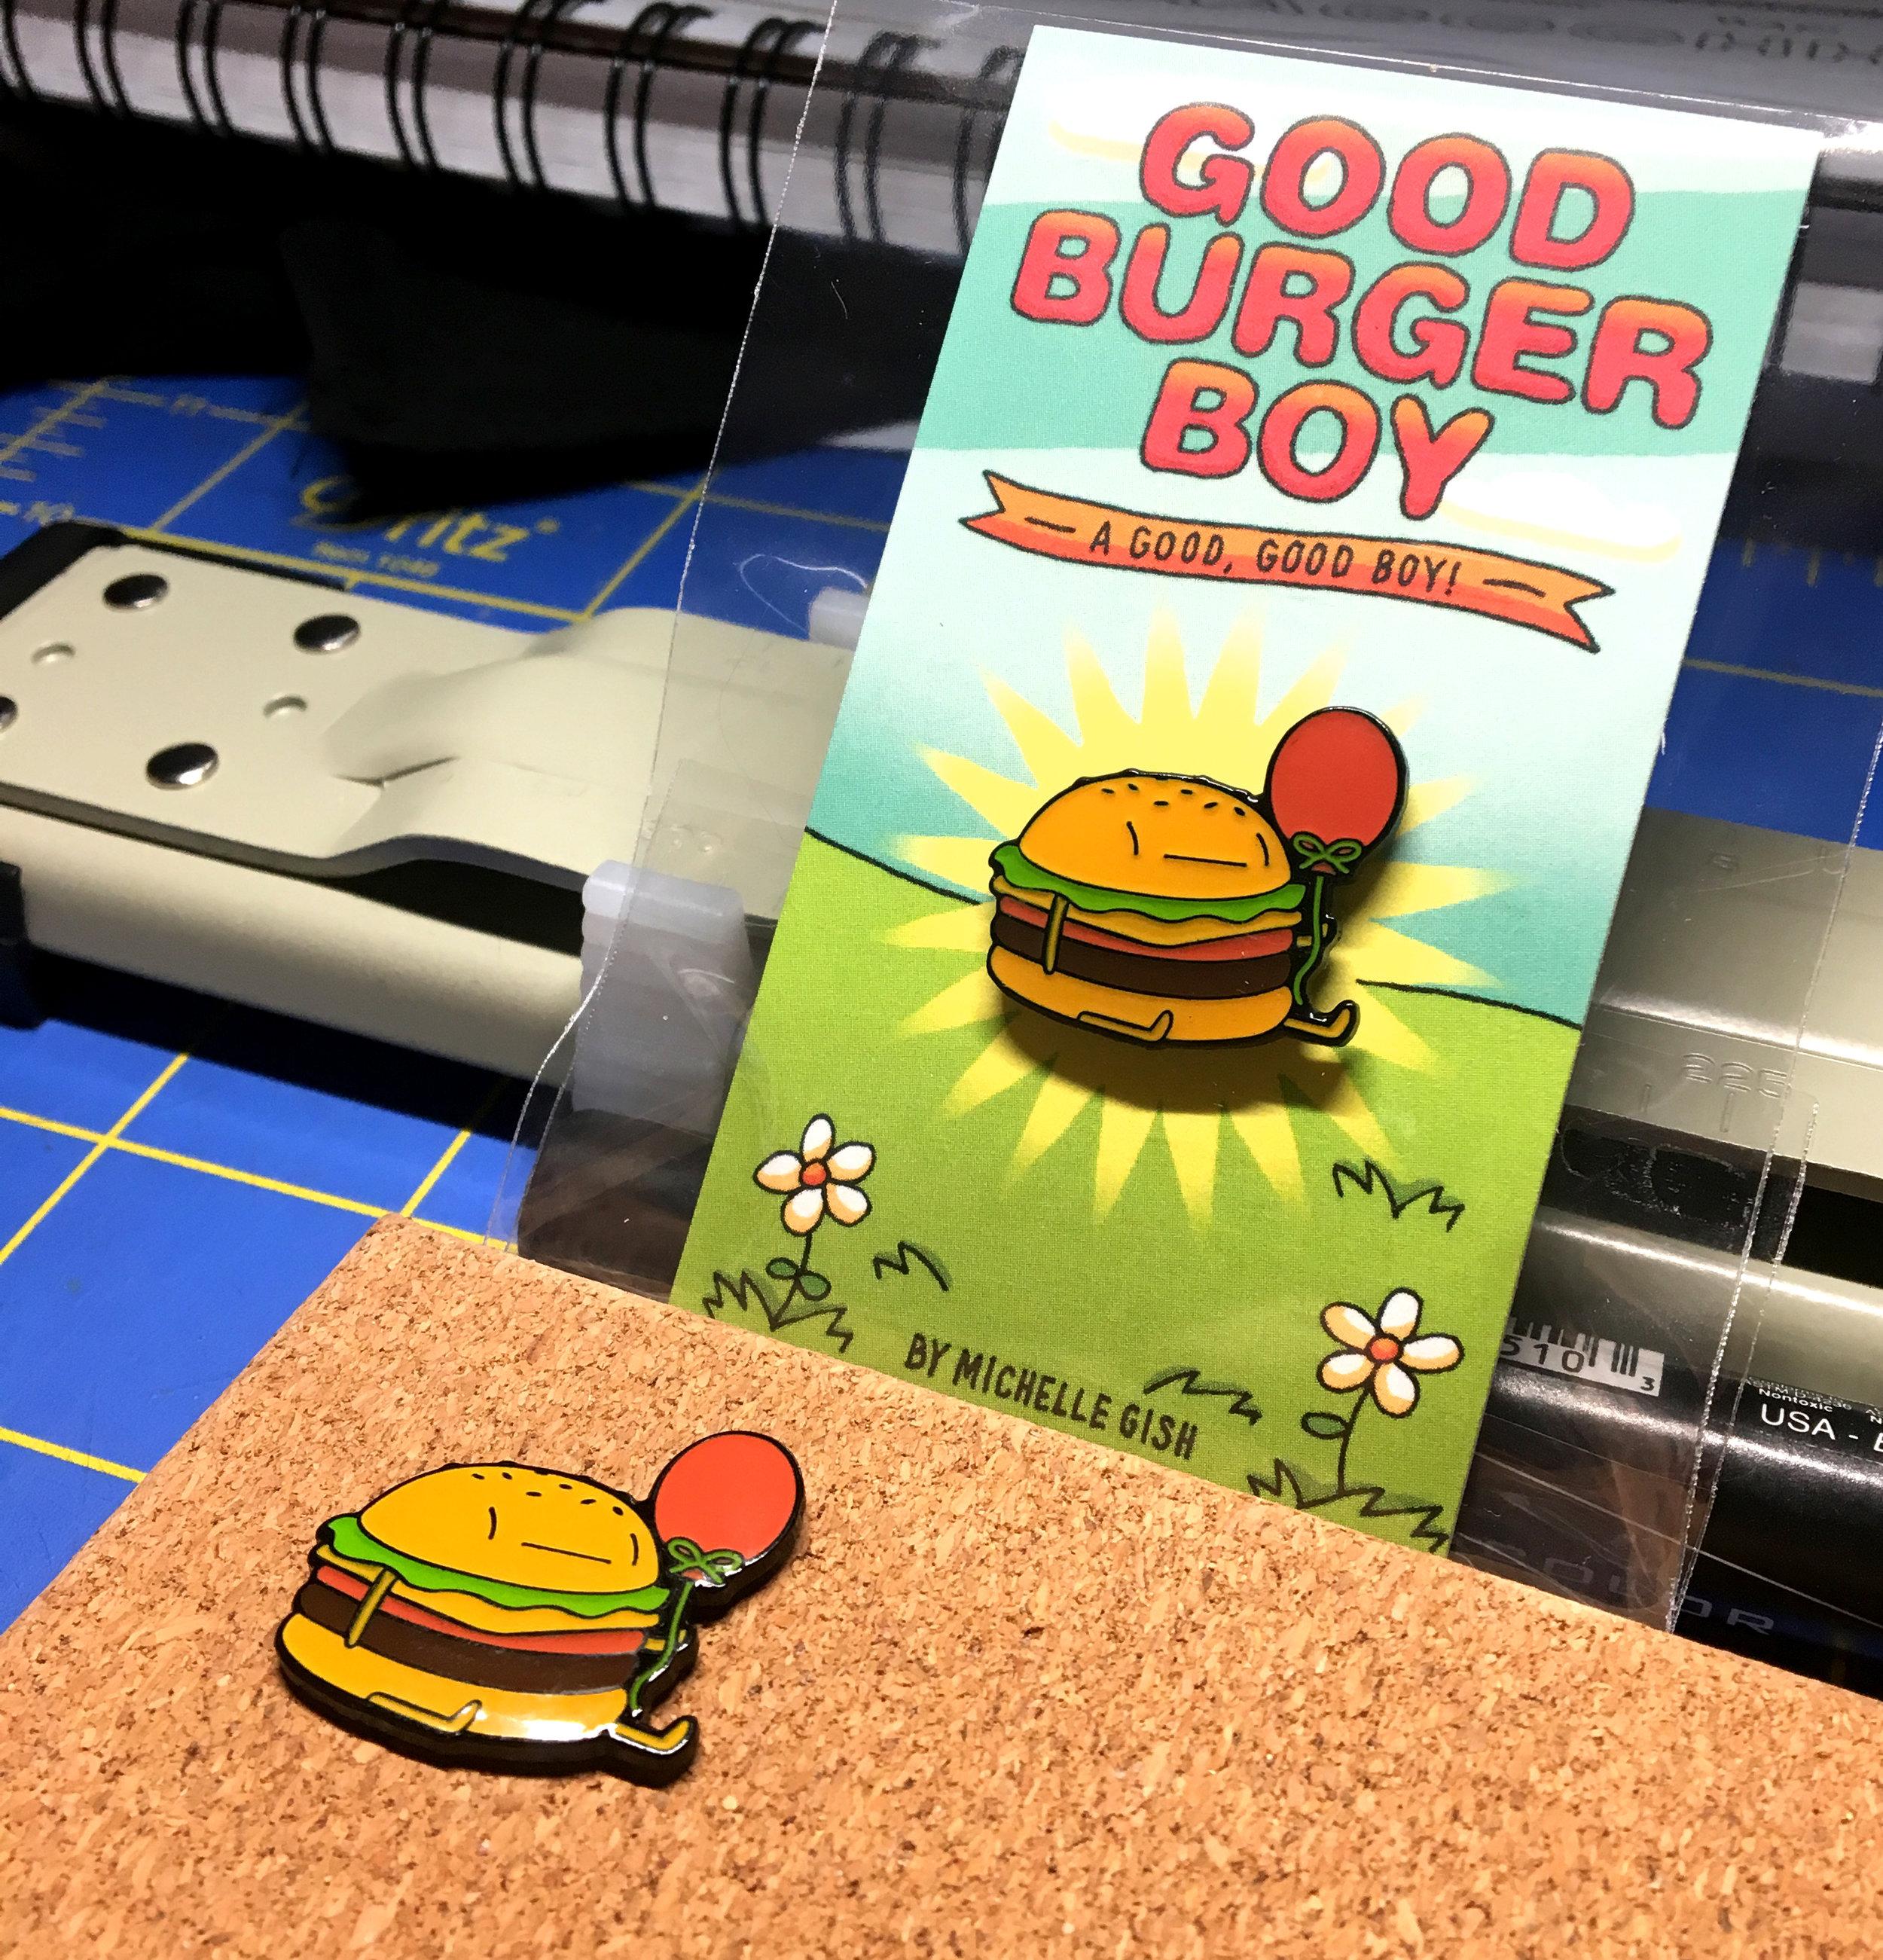 Good Burger Boy enamel pin! He's a good, good boy.